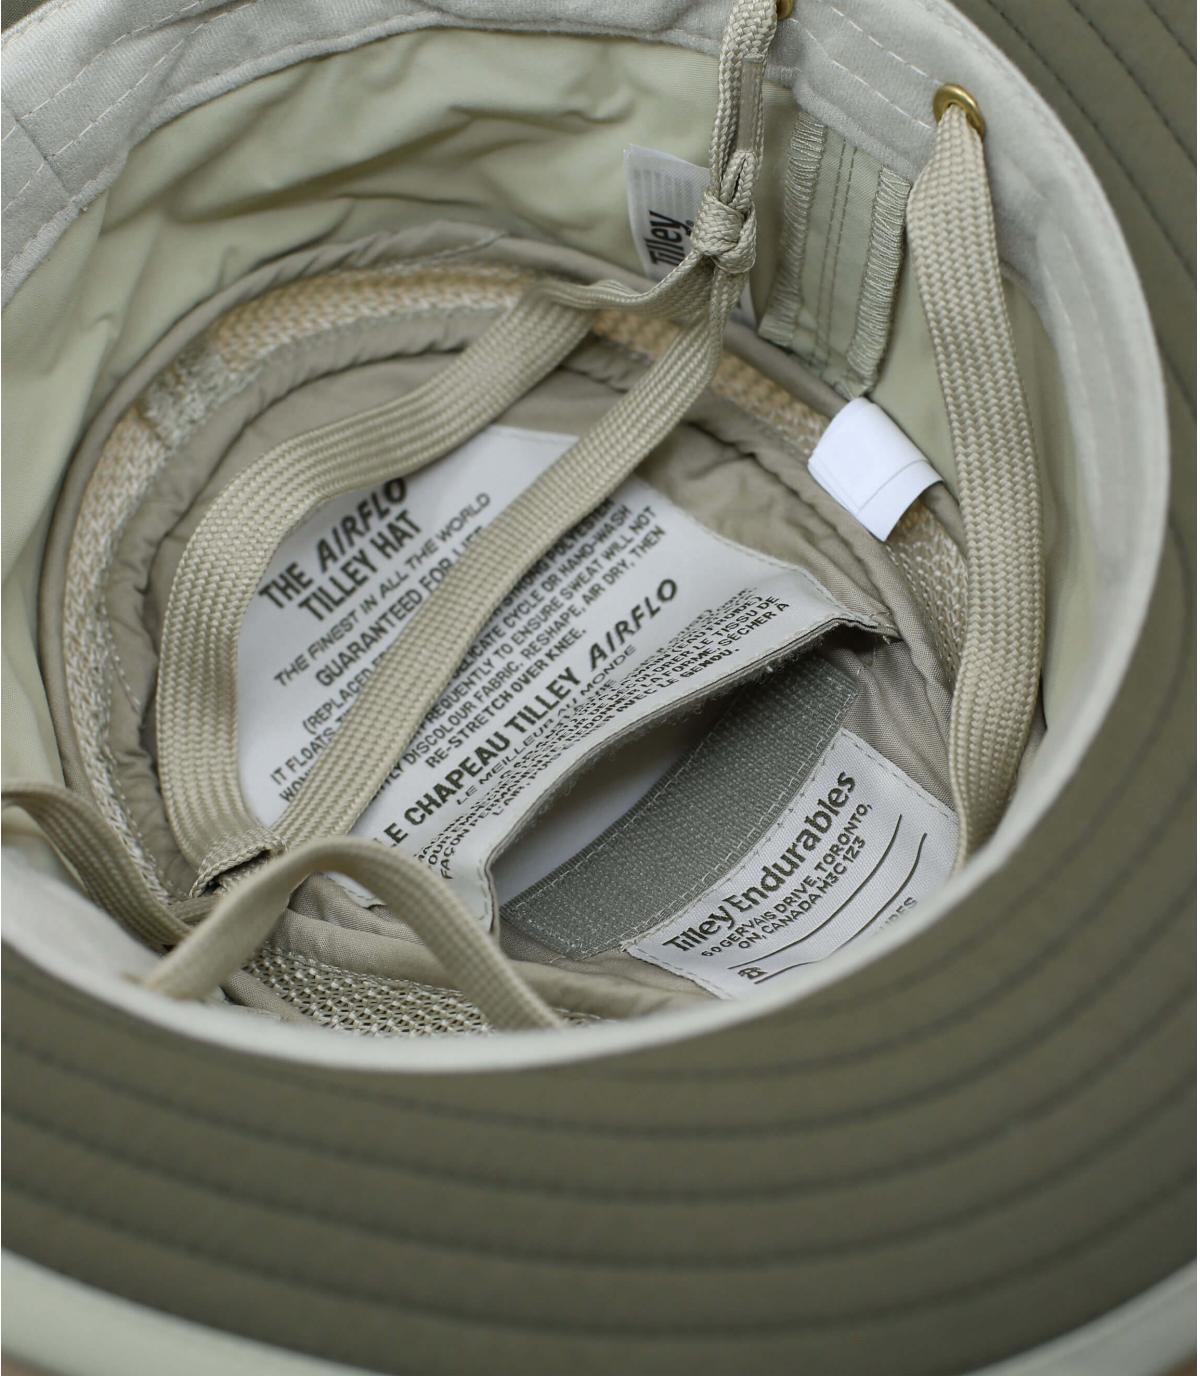 Details LTM5 Airflo khaki olive - afbeeling 4